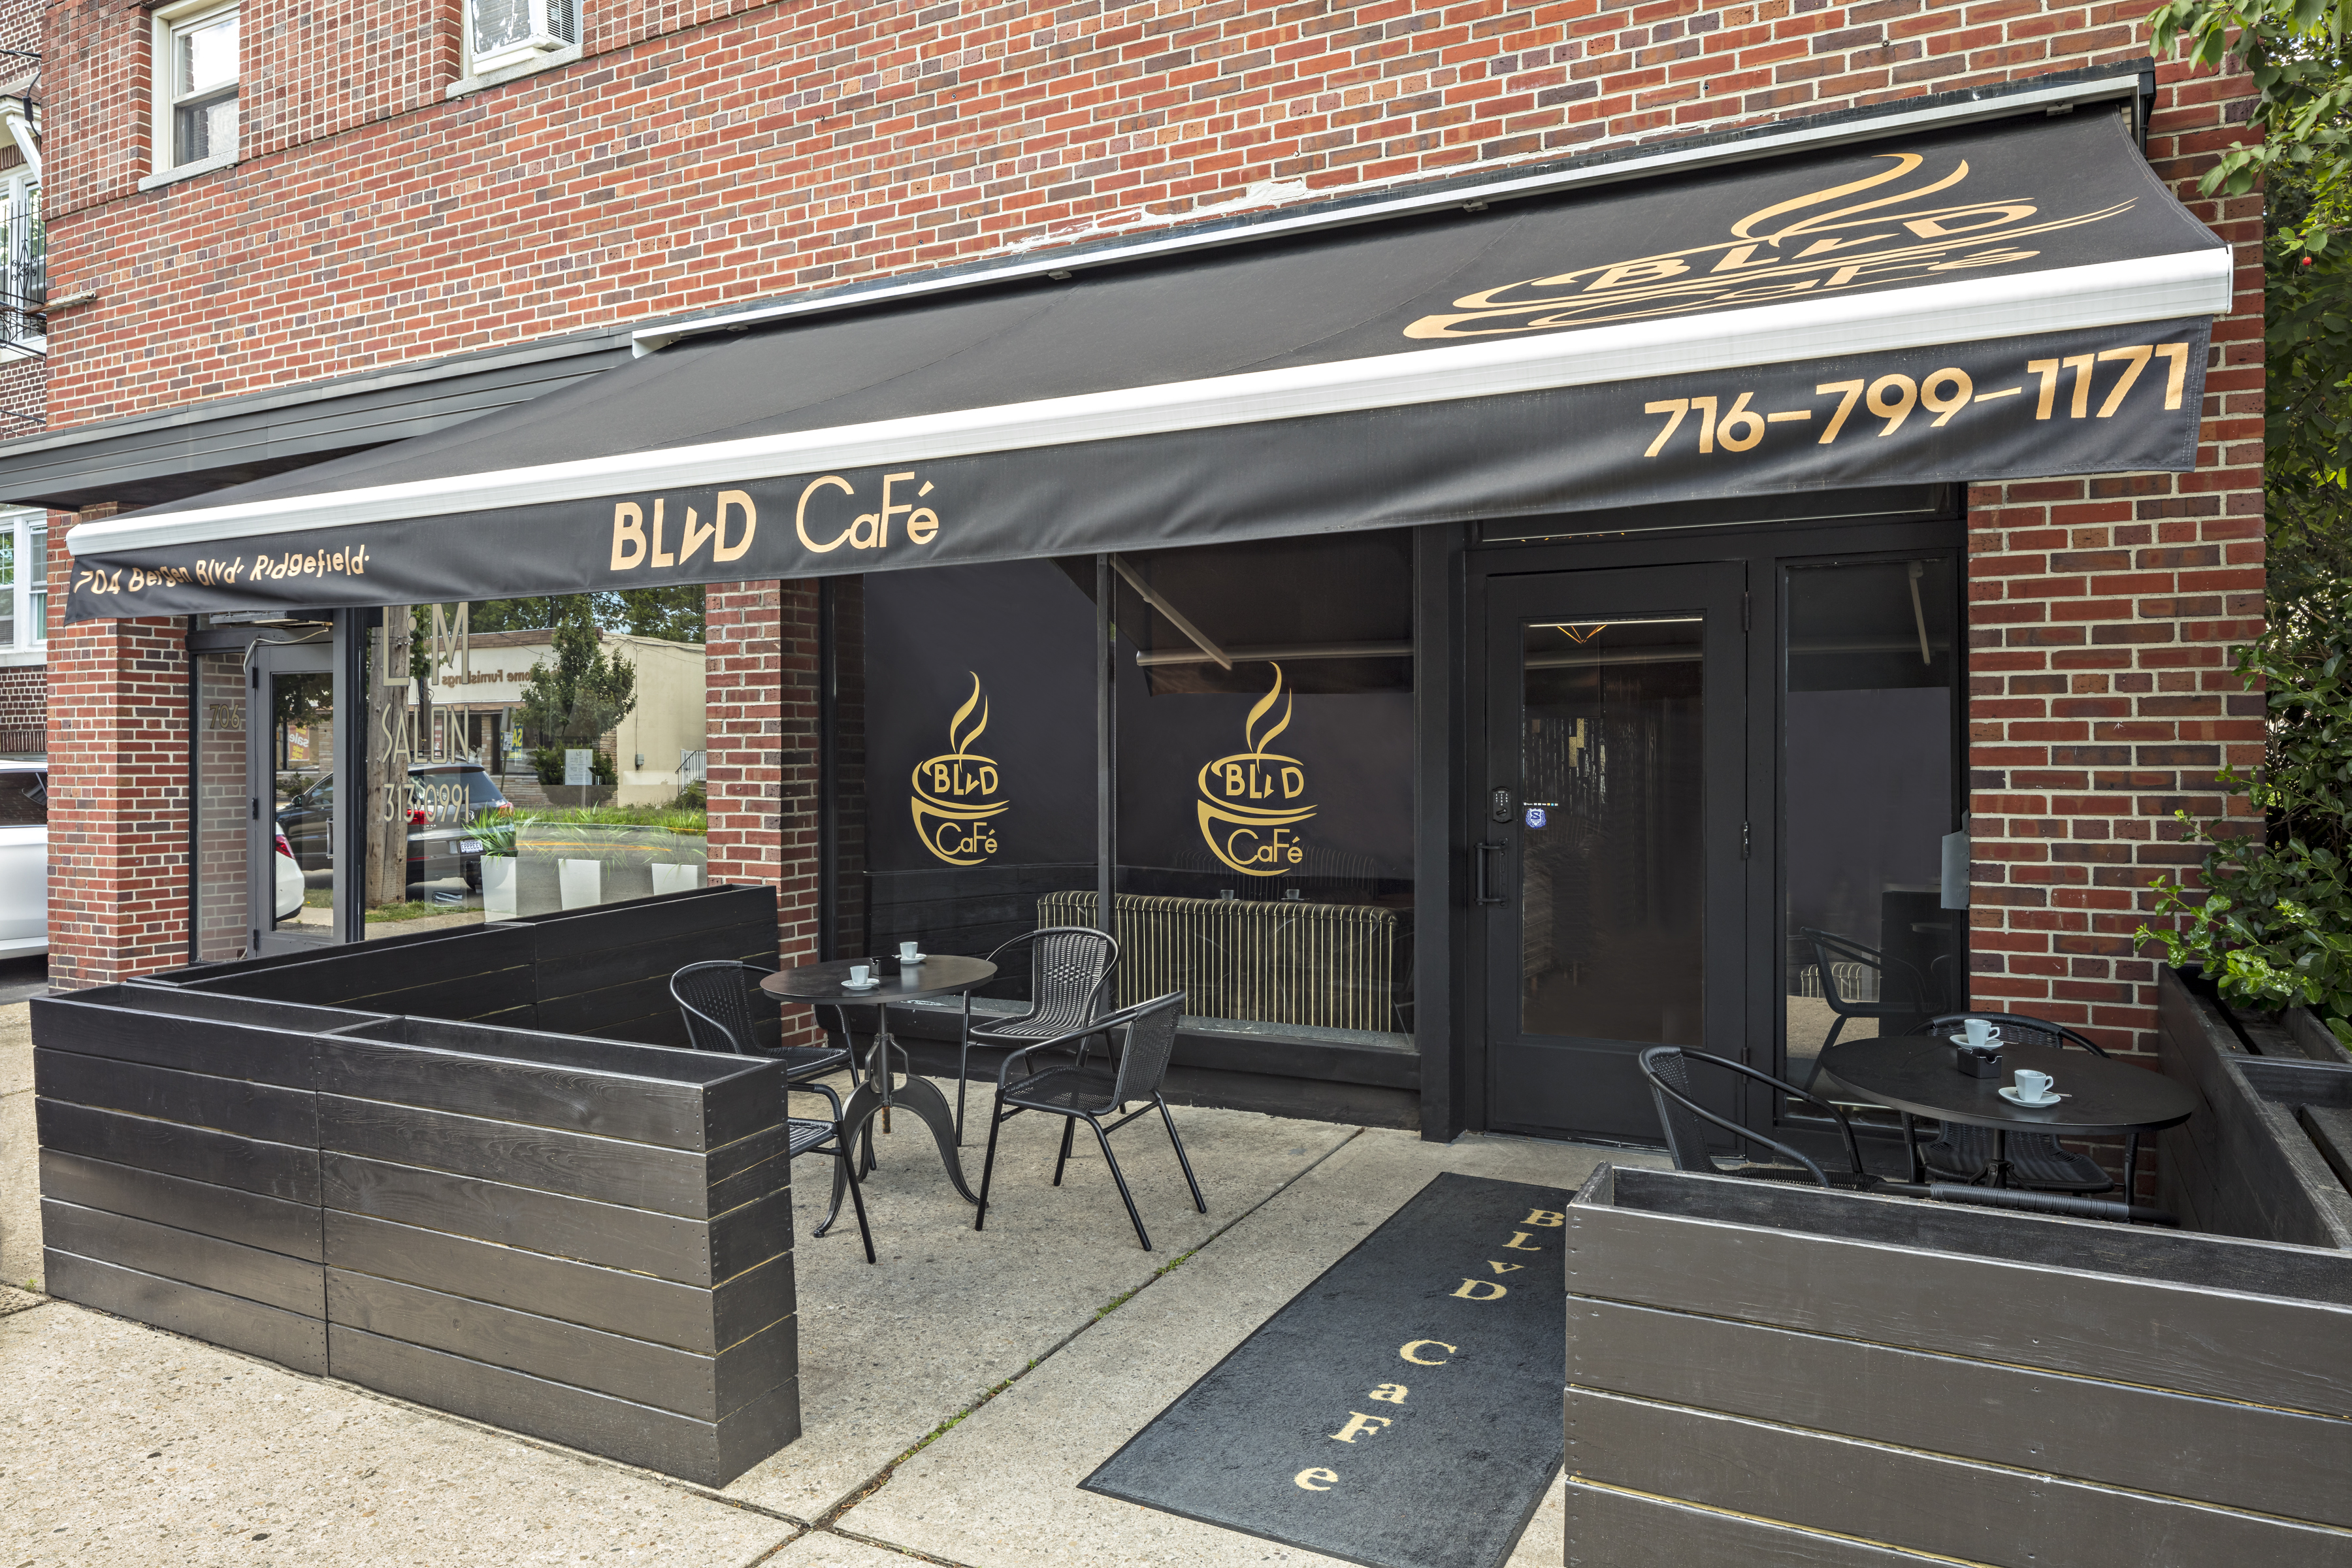 BLVD Cafe, Ridgefield, NJ